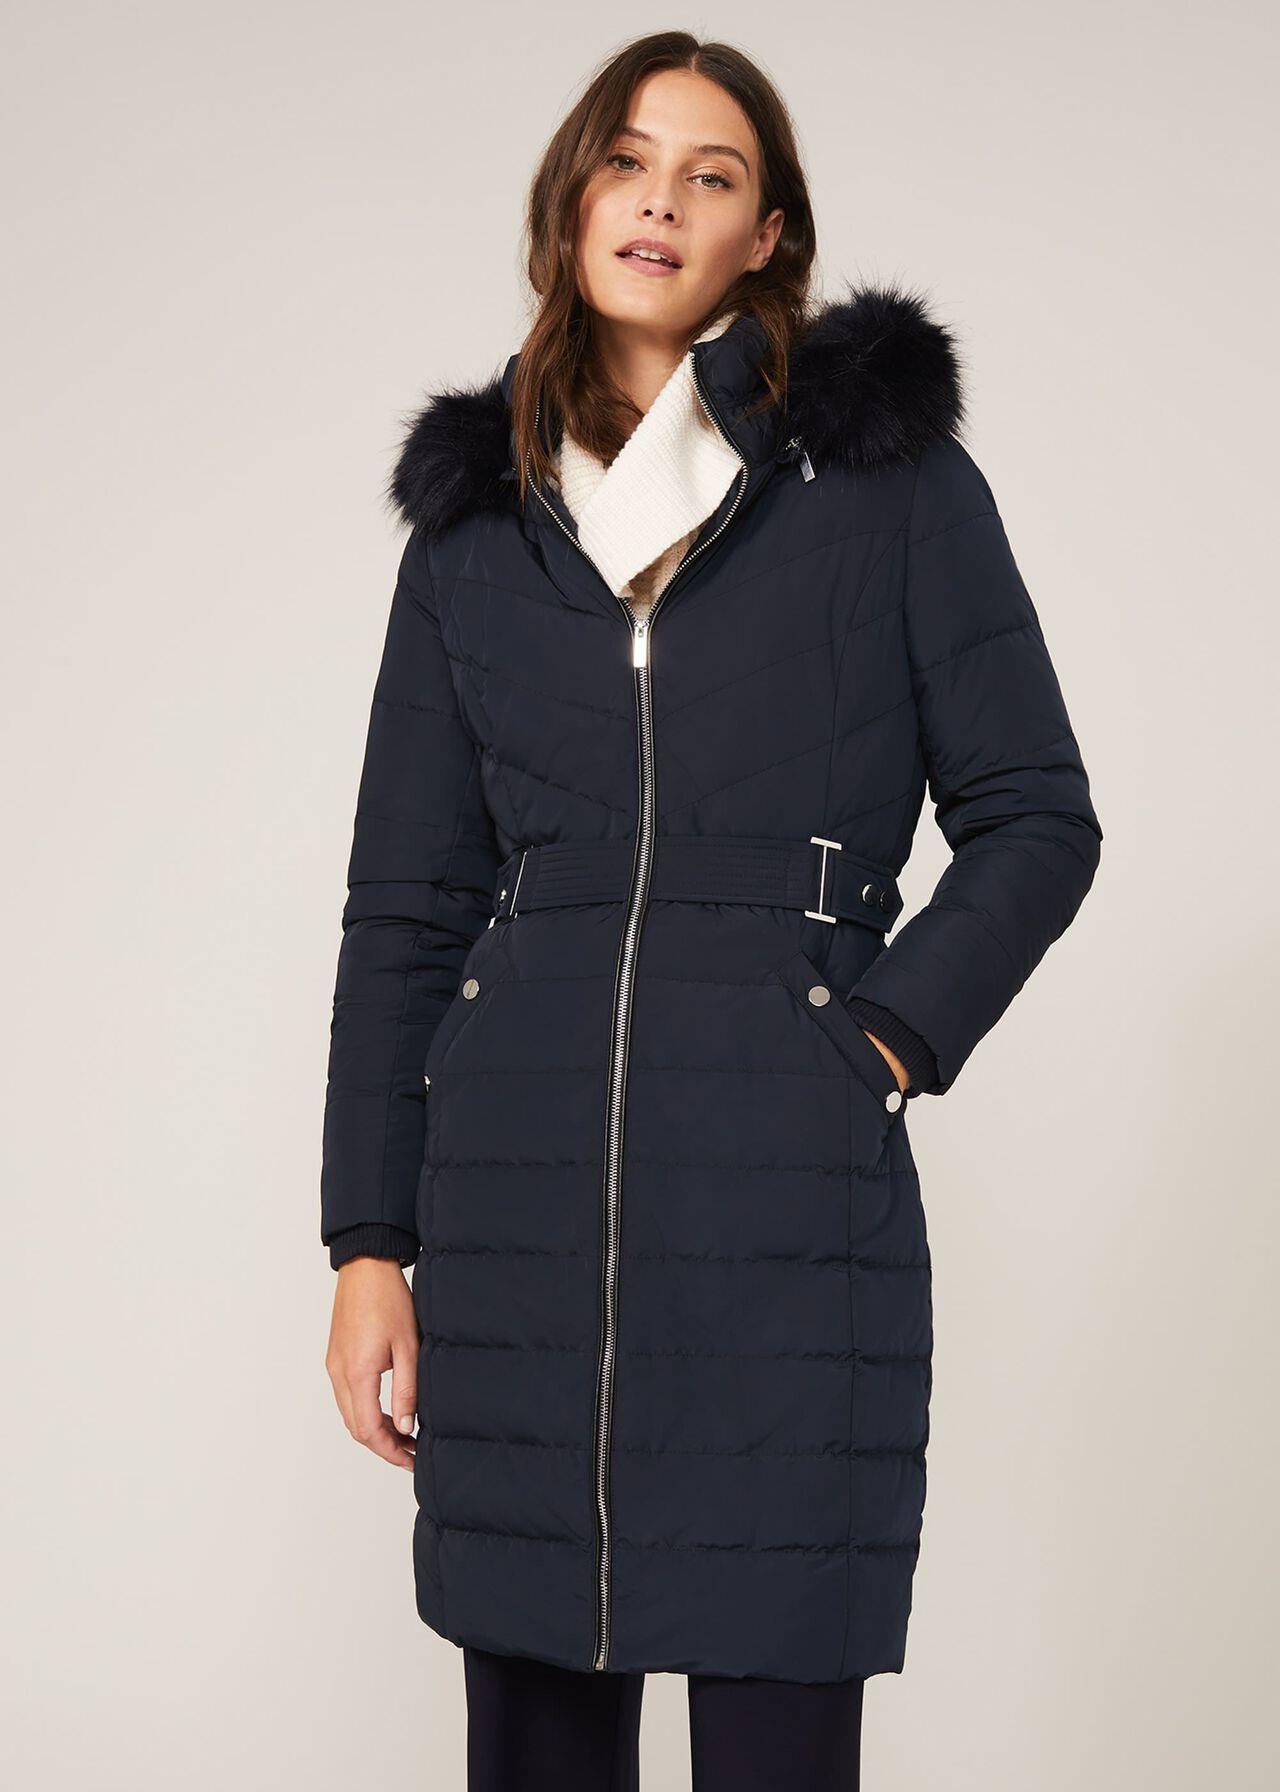 Elouise Buckle Long Puffer Coat